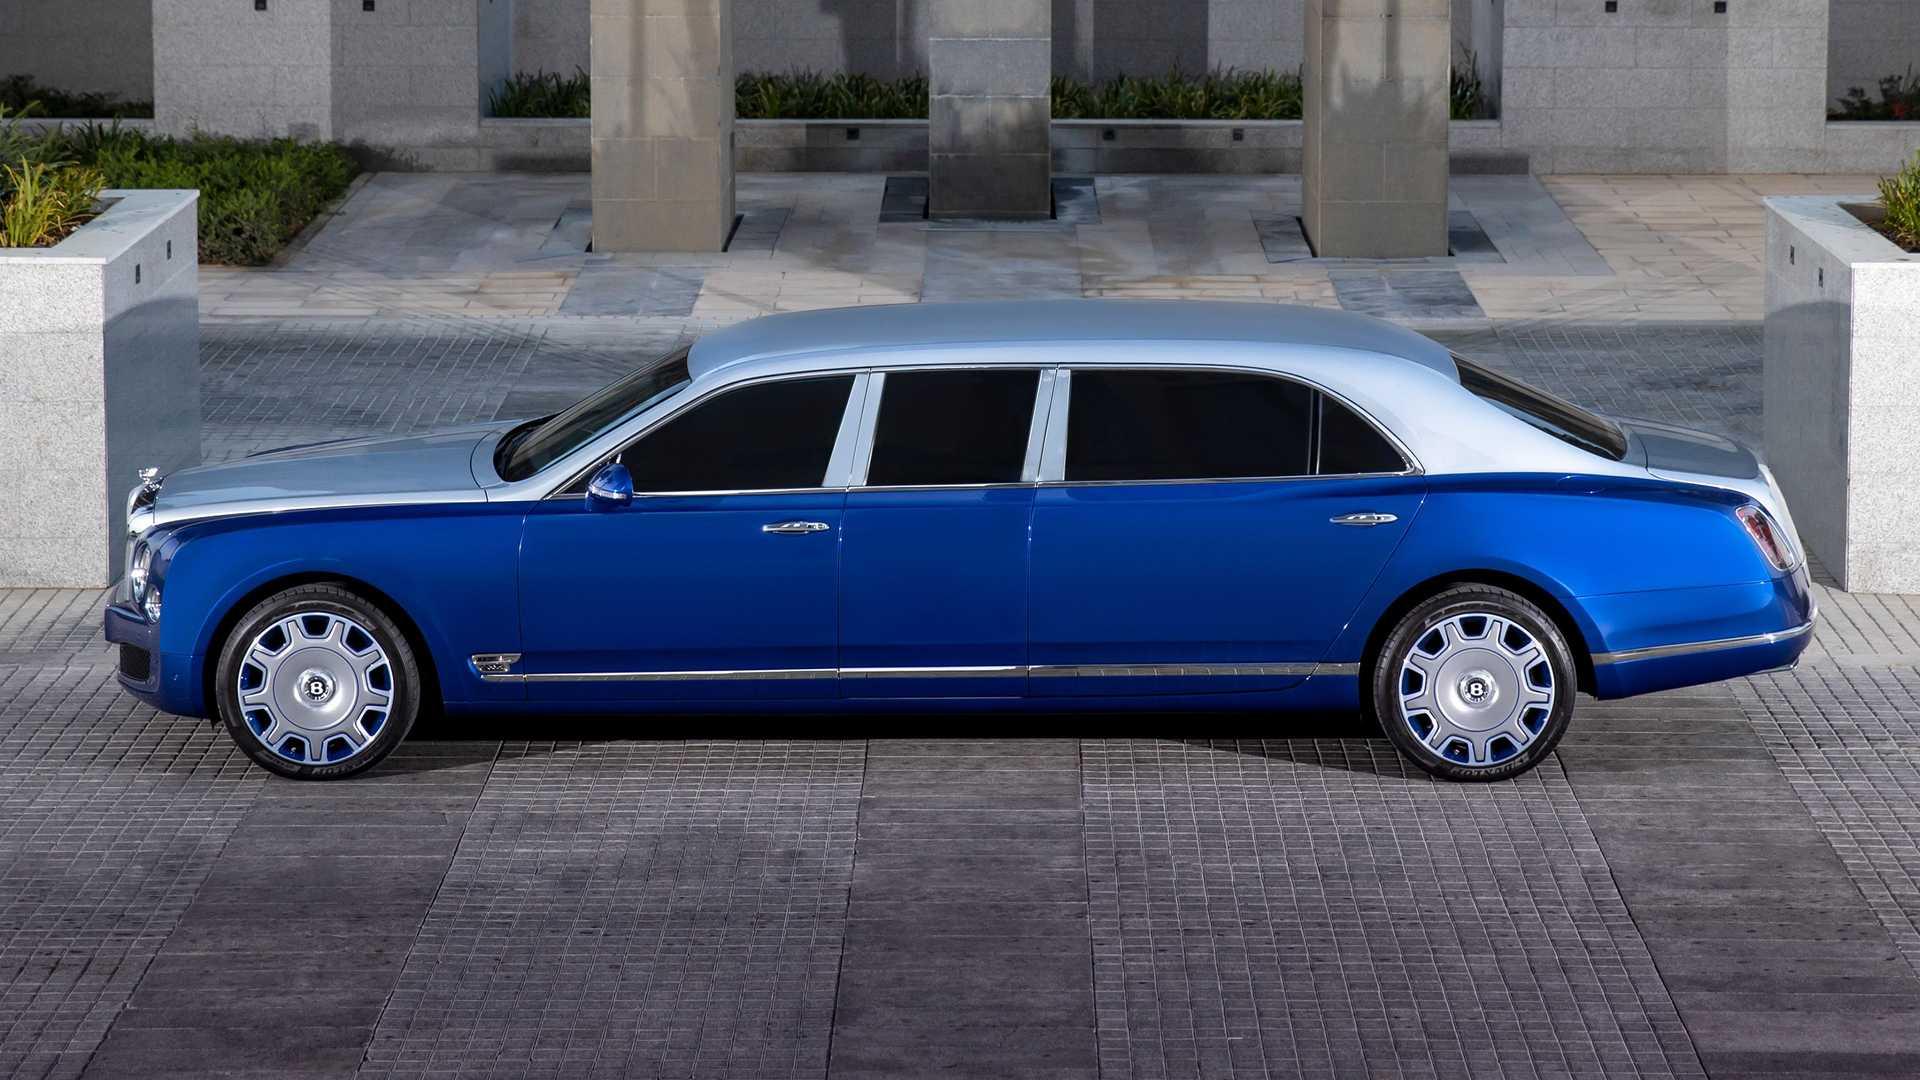 Bentley-Mulsanne-Grand-Limousine-by-Mulliner-5